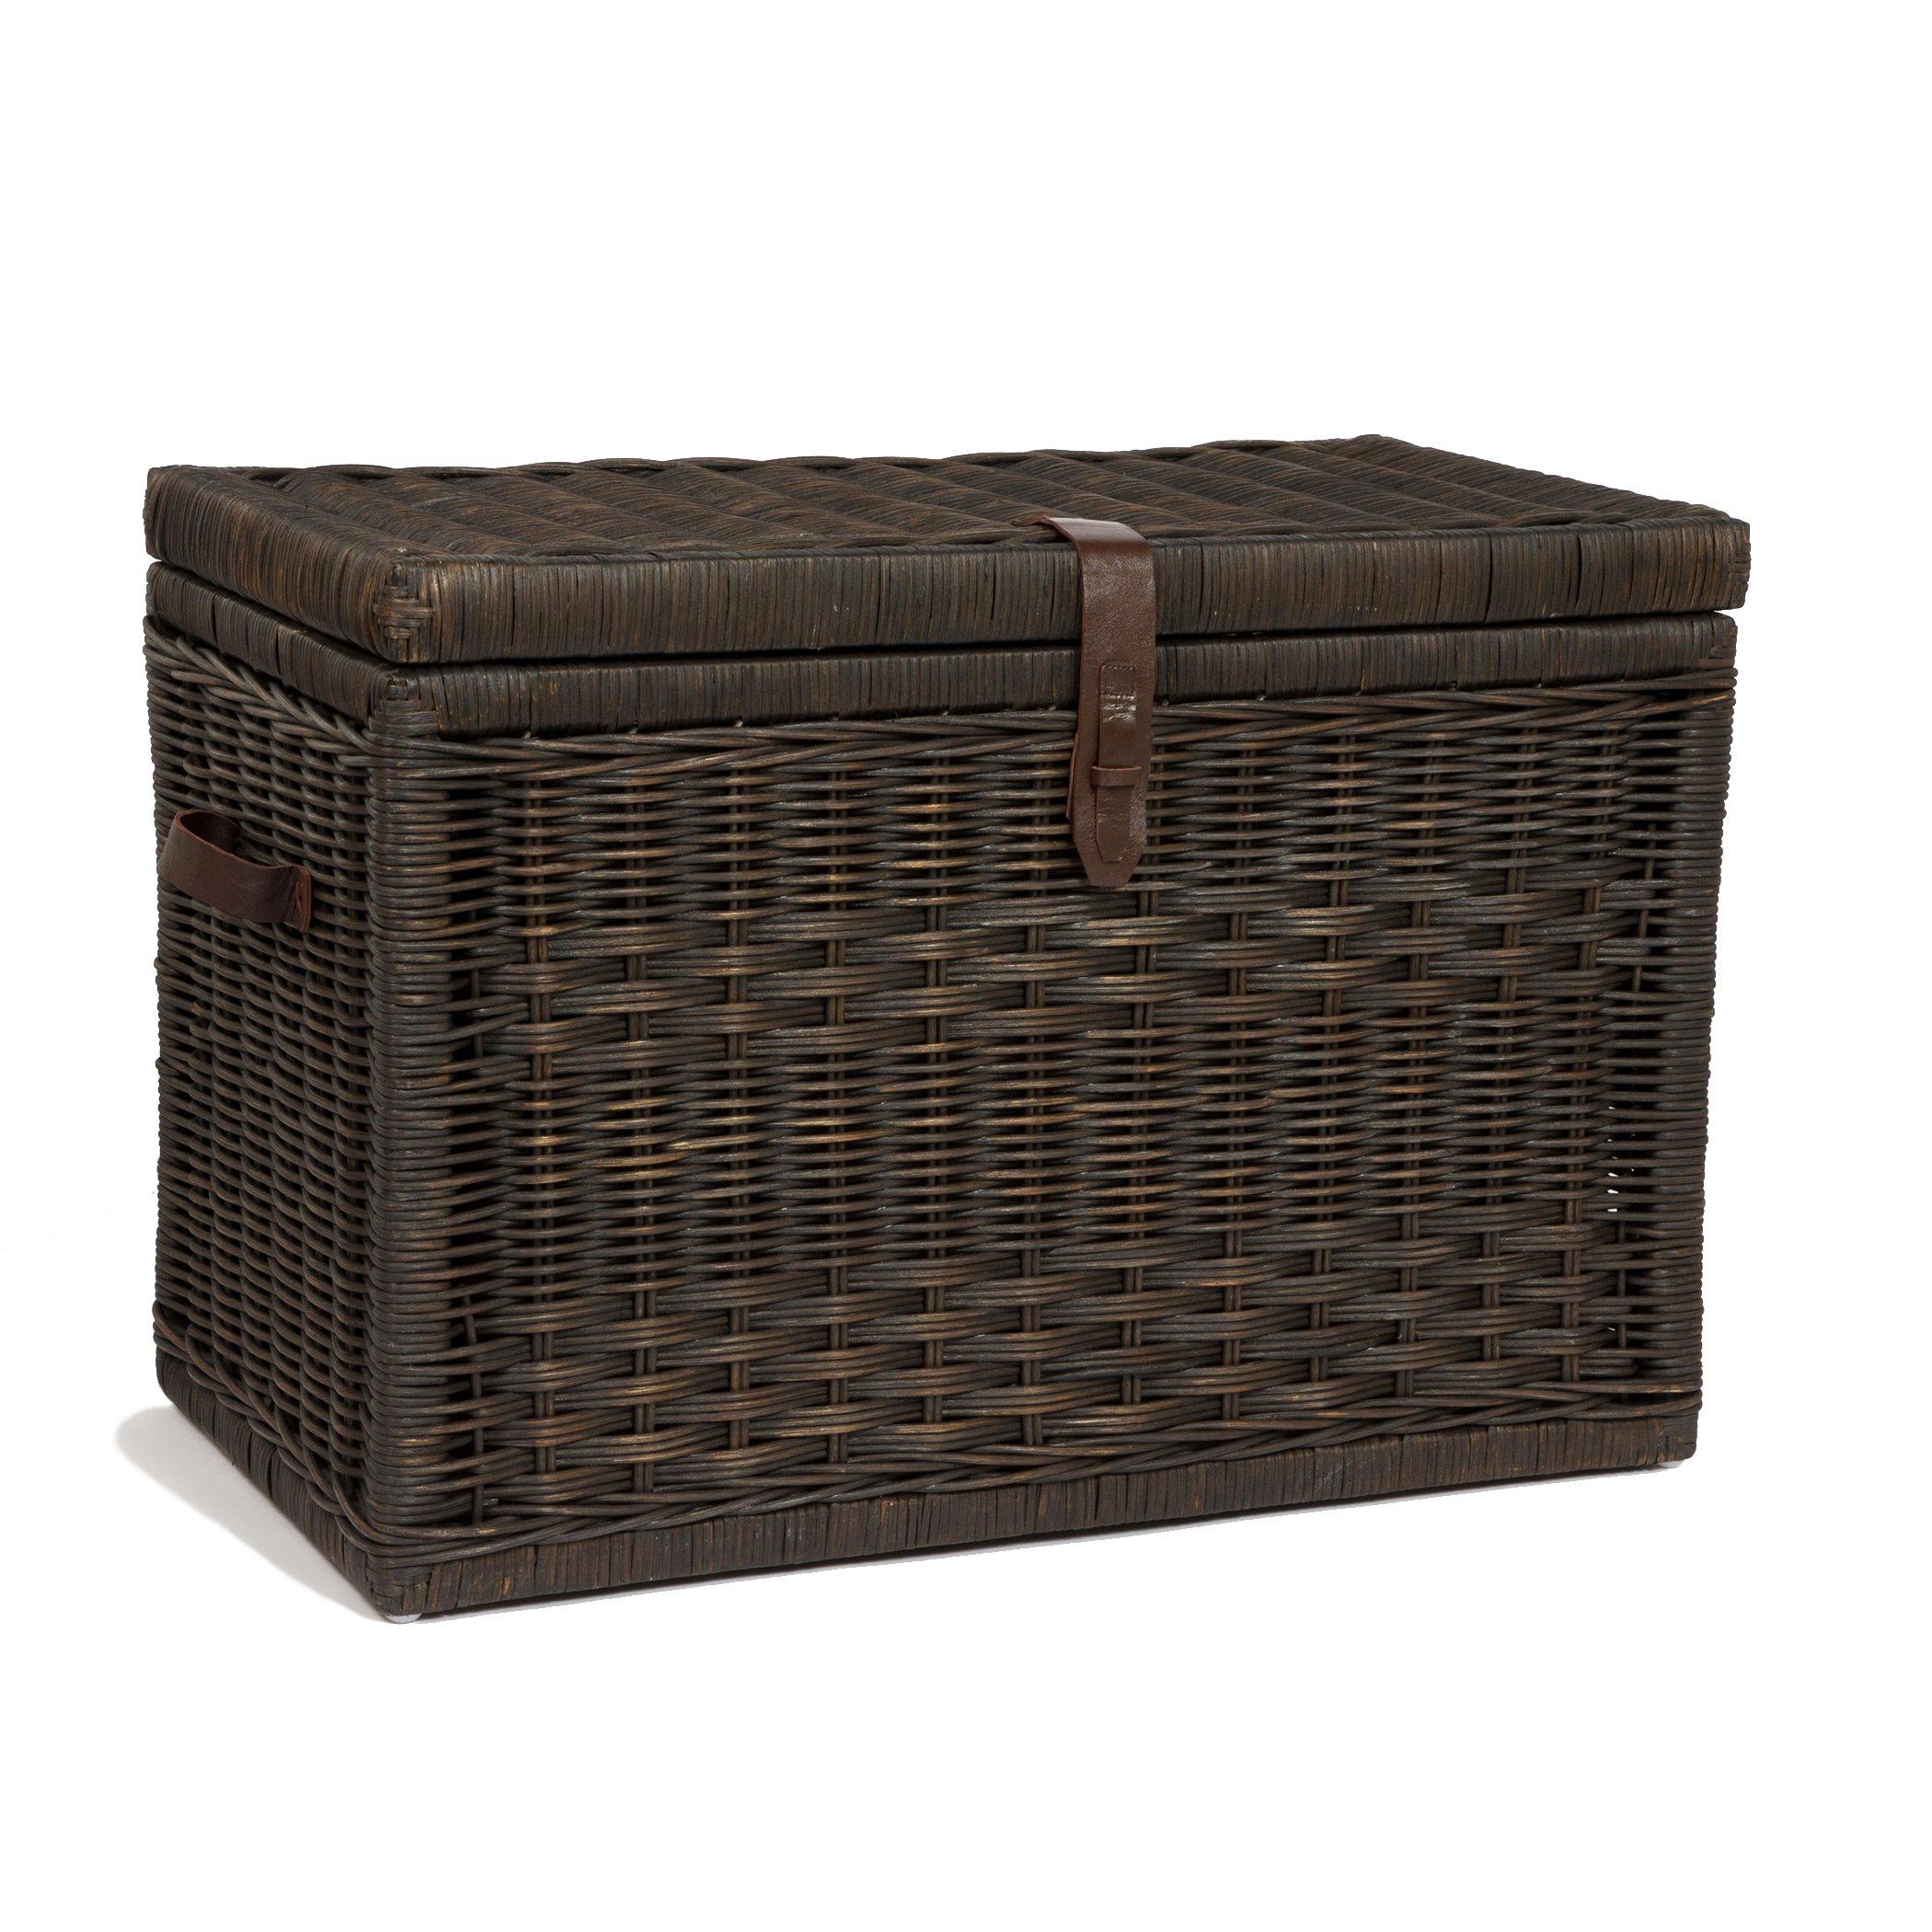 The Basket Lady Wicker Storage Trunk   Wicker Storage Chest, Large, Antique Walnut Brown